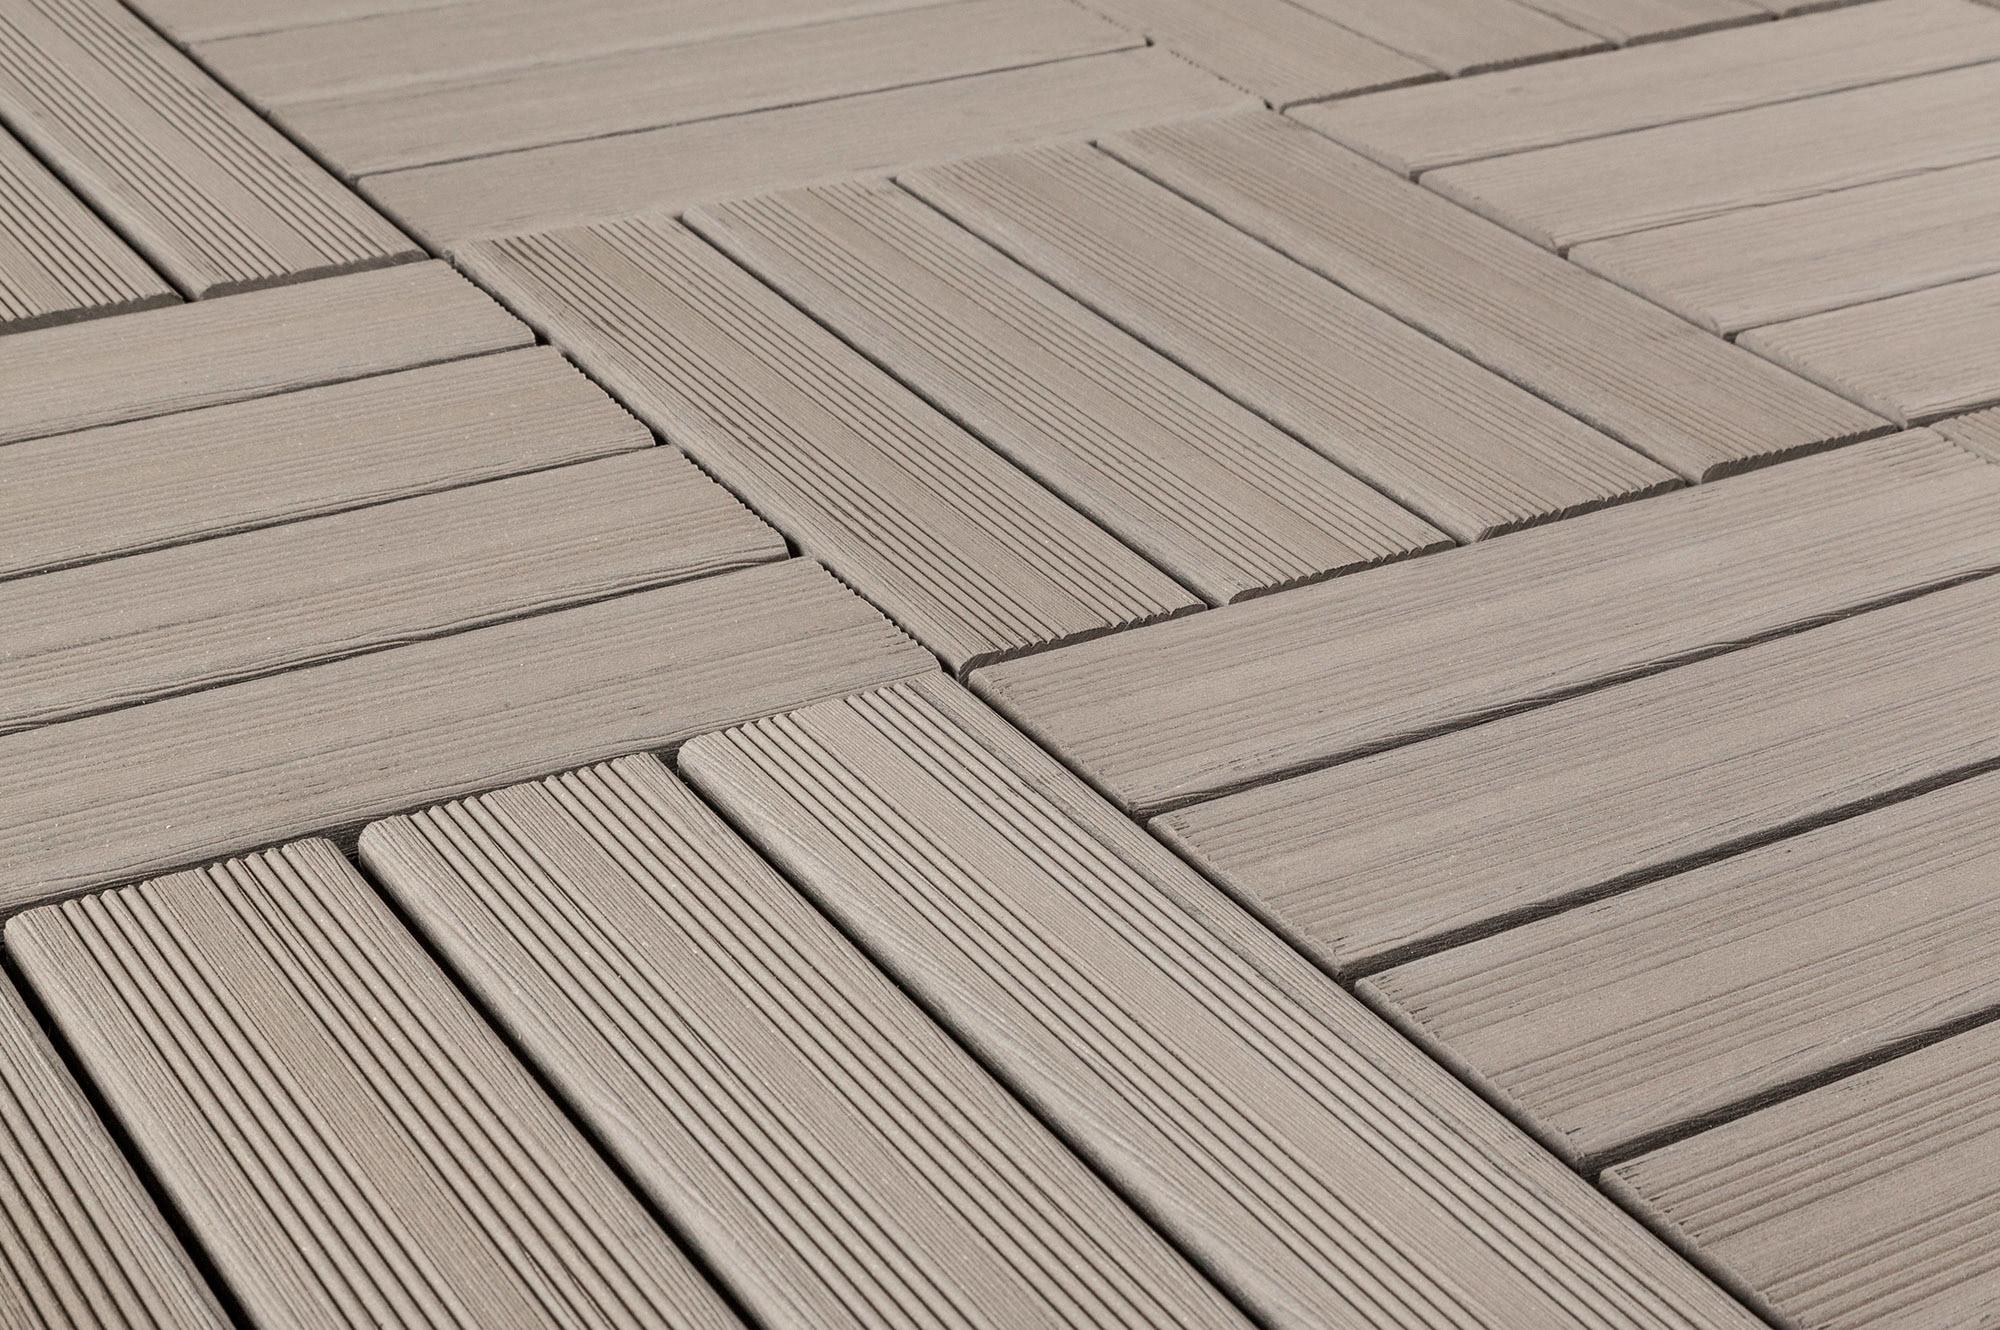 36x12 deck